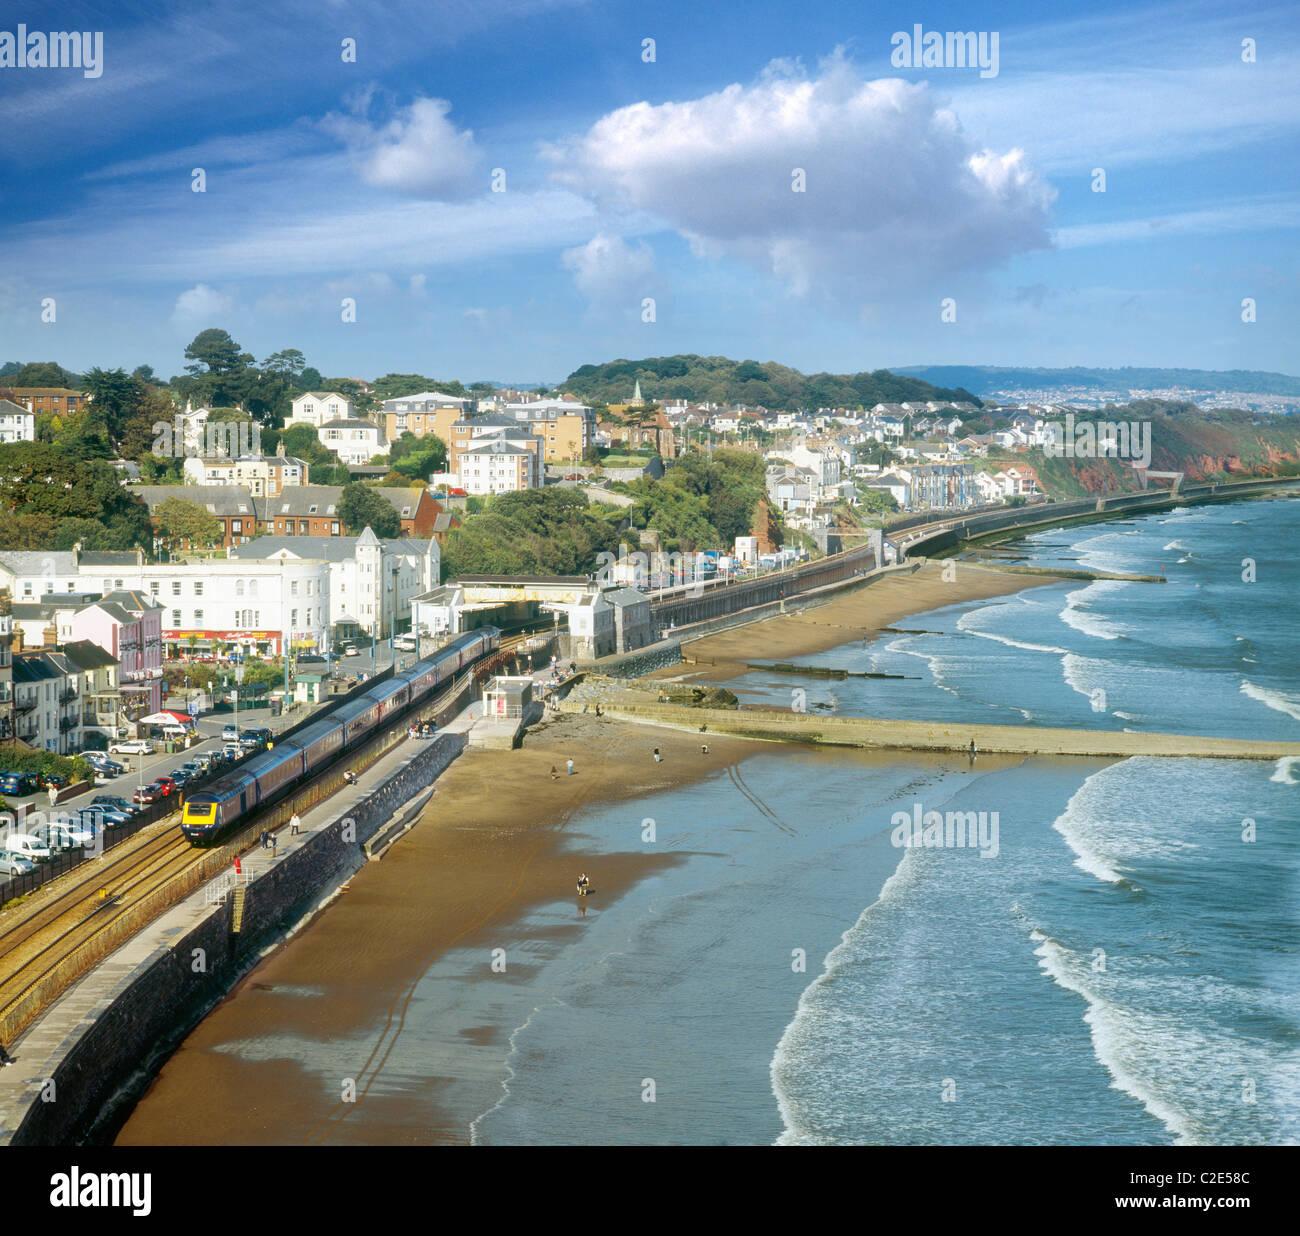 the-seaside-resort-of-dawlish-in-devon-w